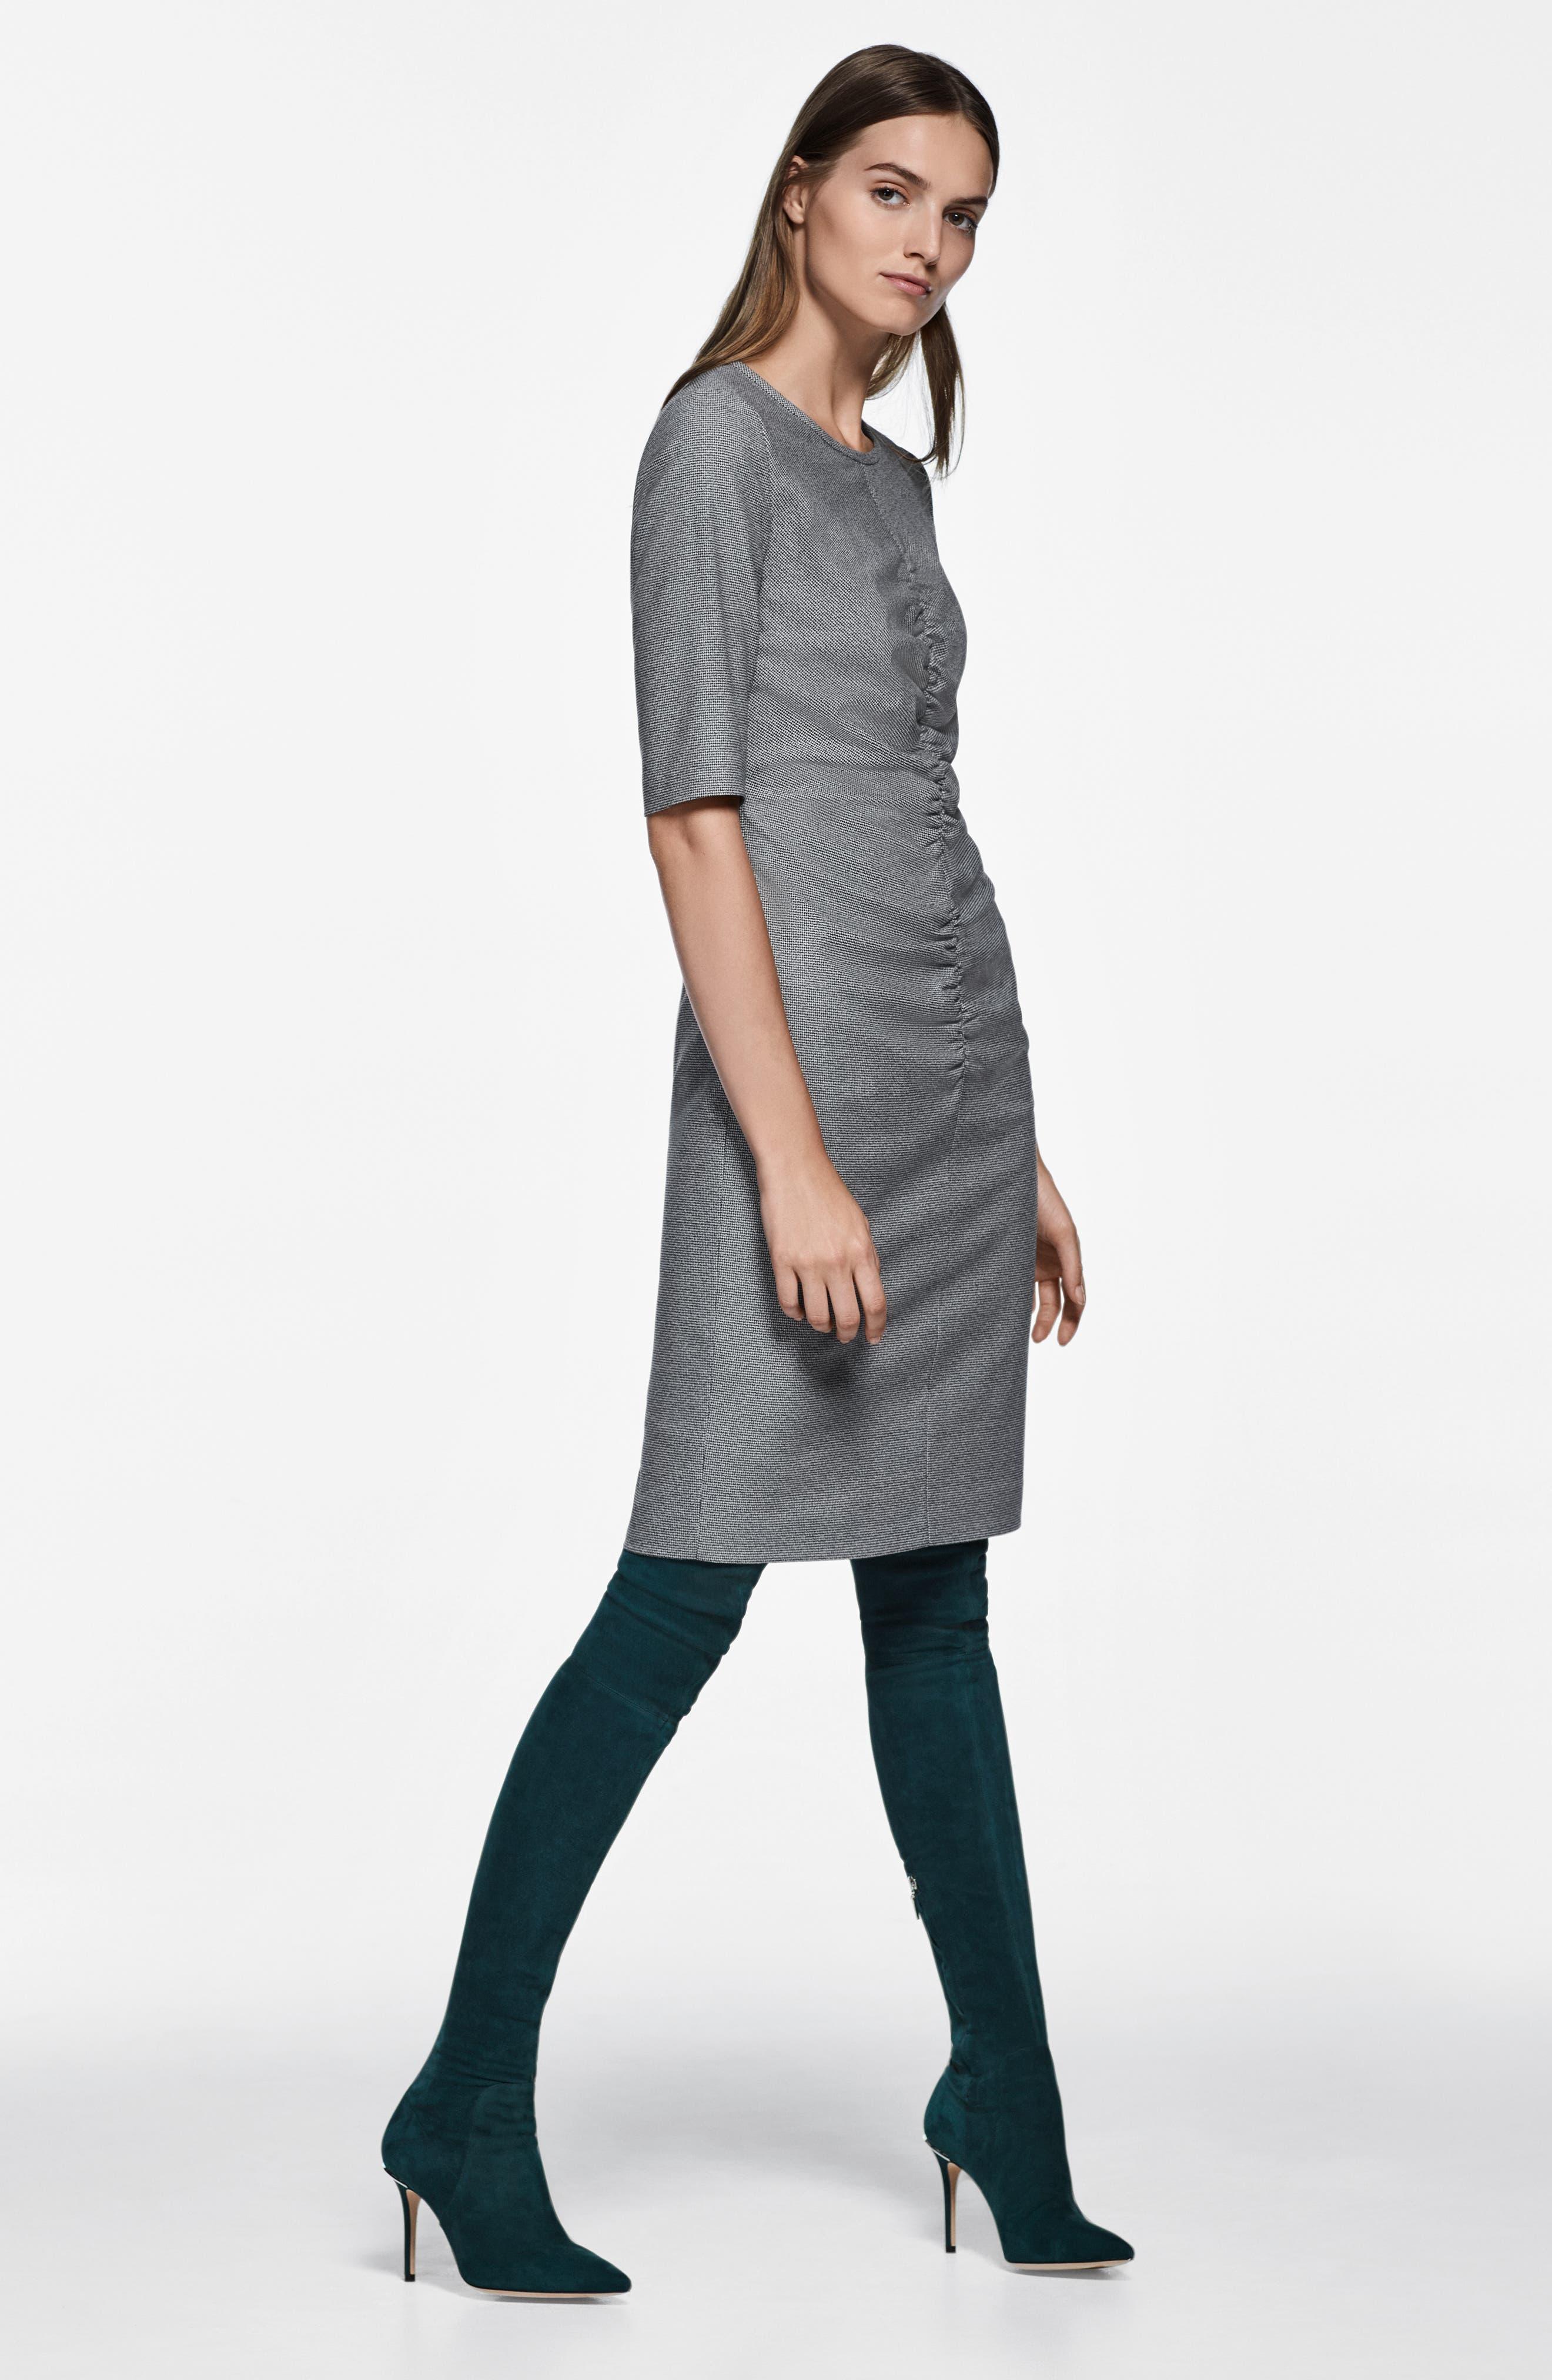 Dirafia Blurred Optic Dress,                             Alternate thumbnail 8, color,                             BLACK FANTASY